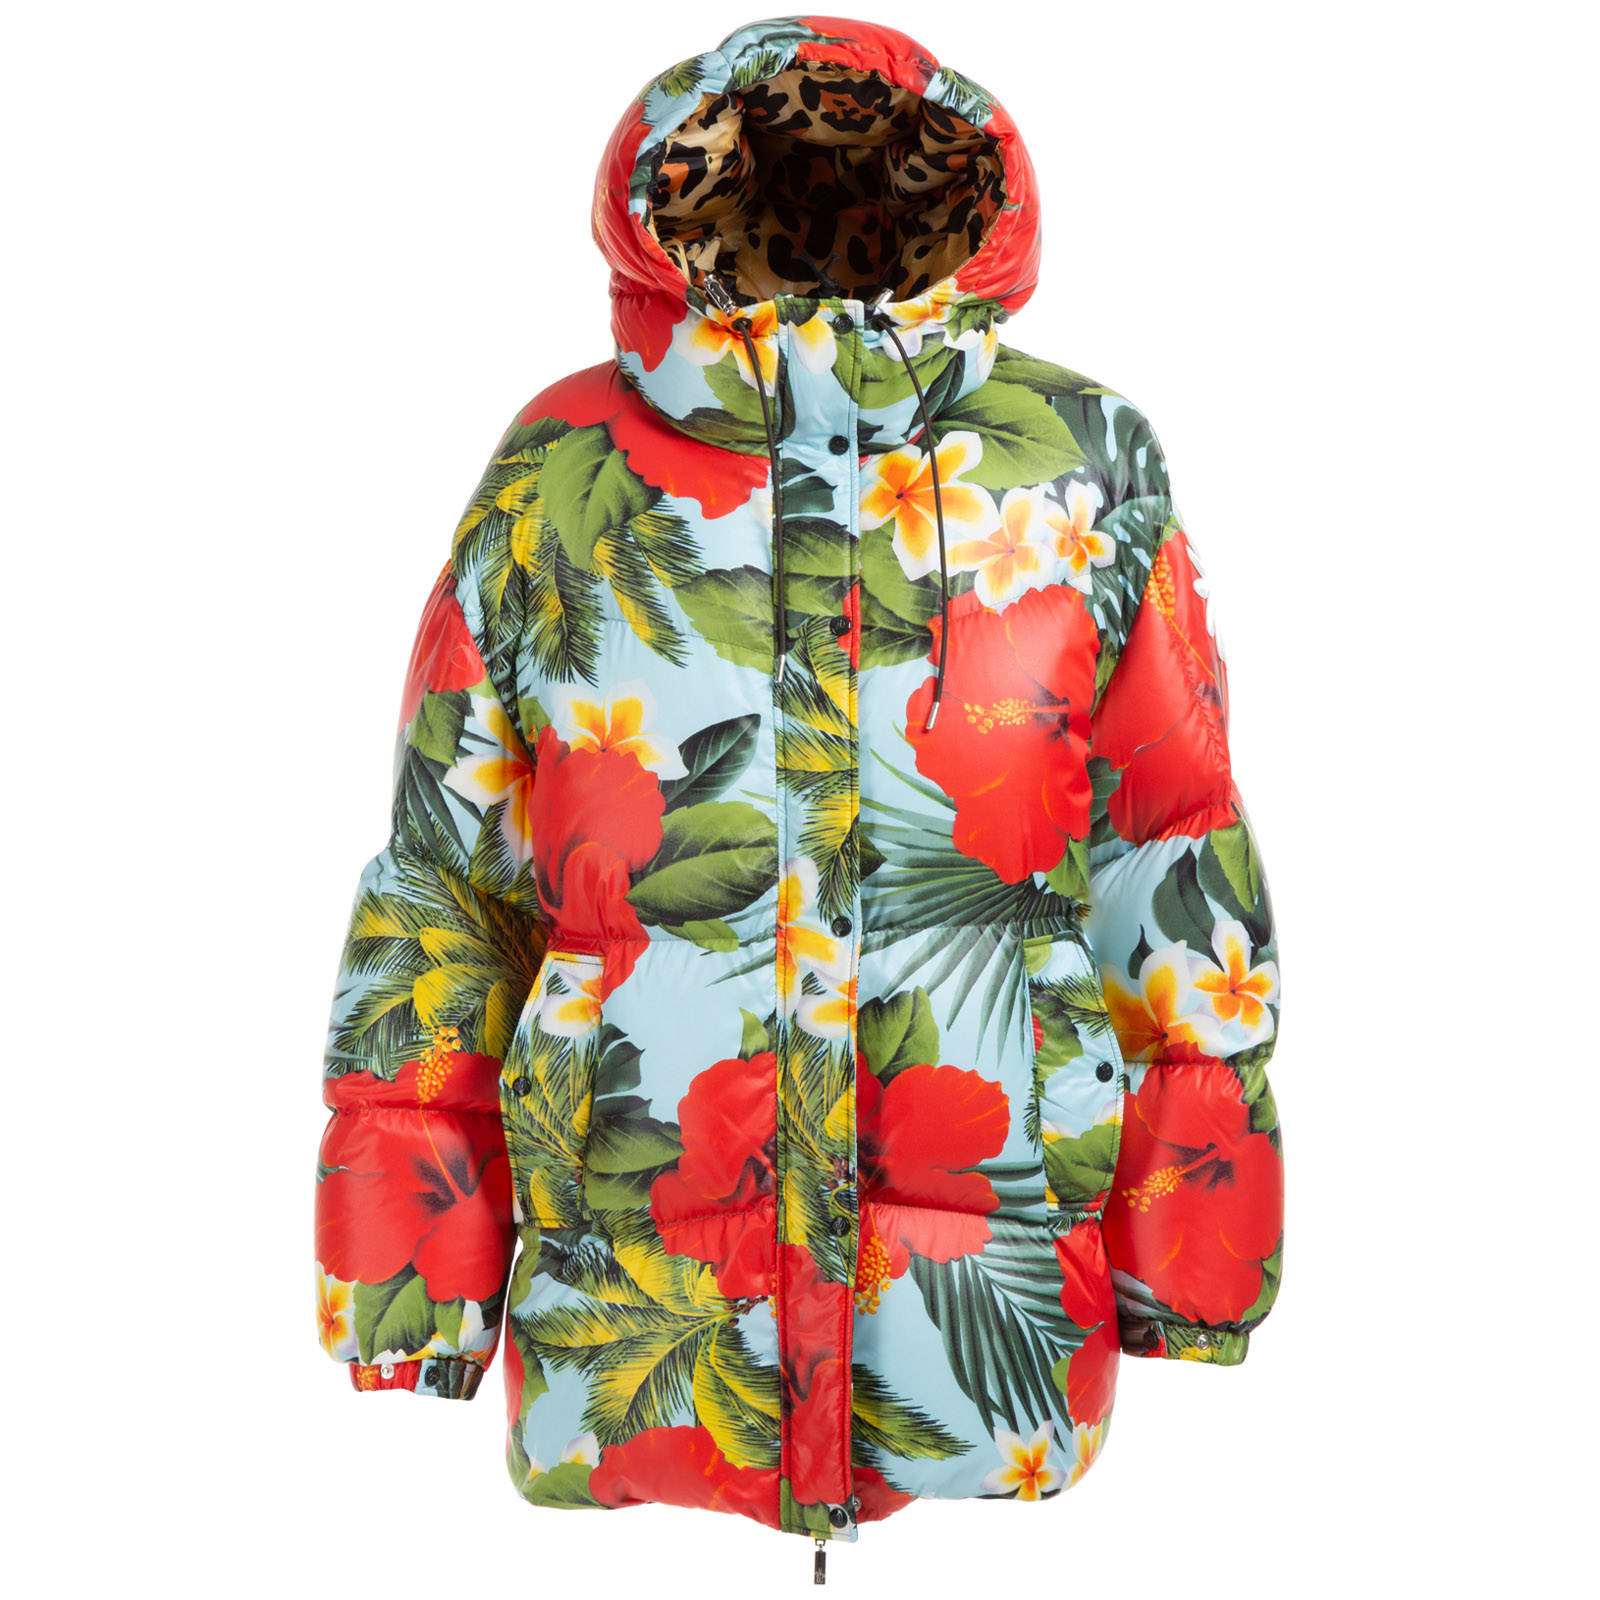 Moncler Genius Lobby Boy Down Jacket